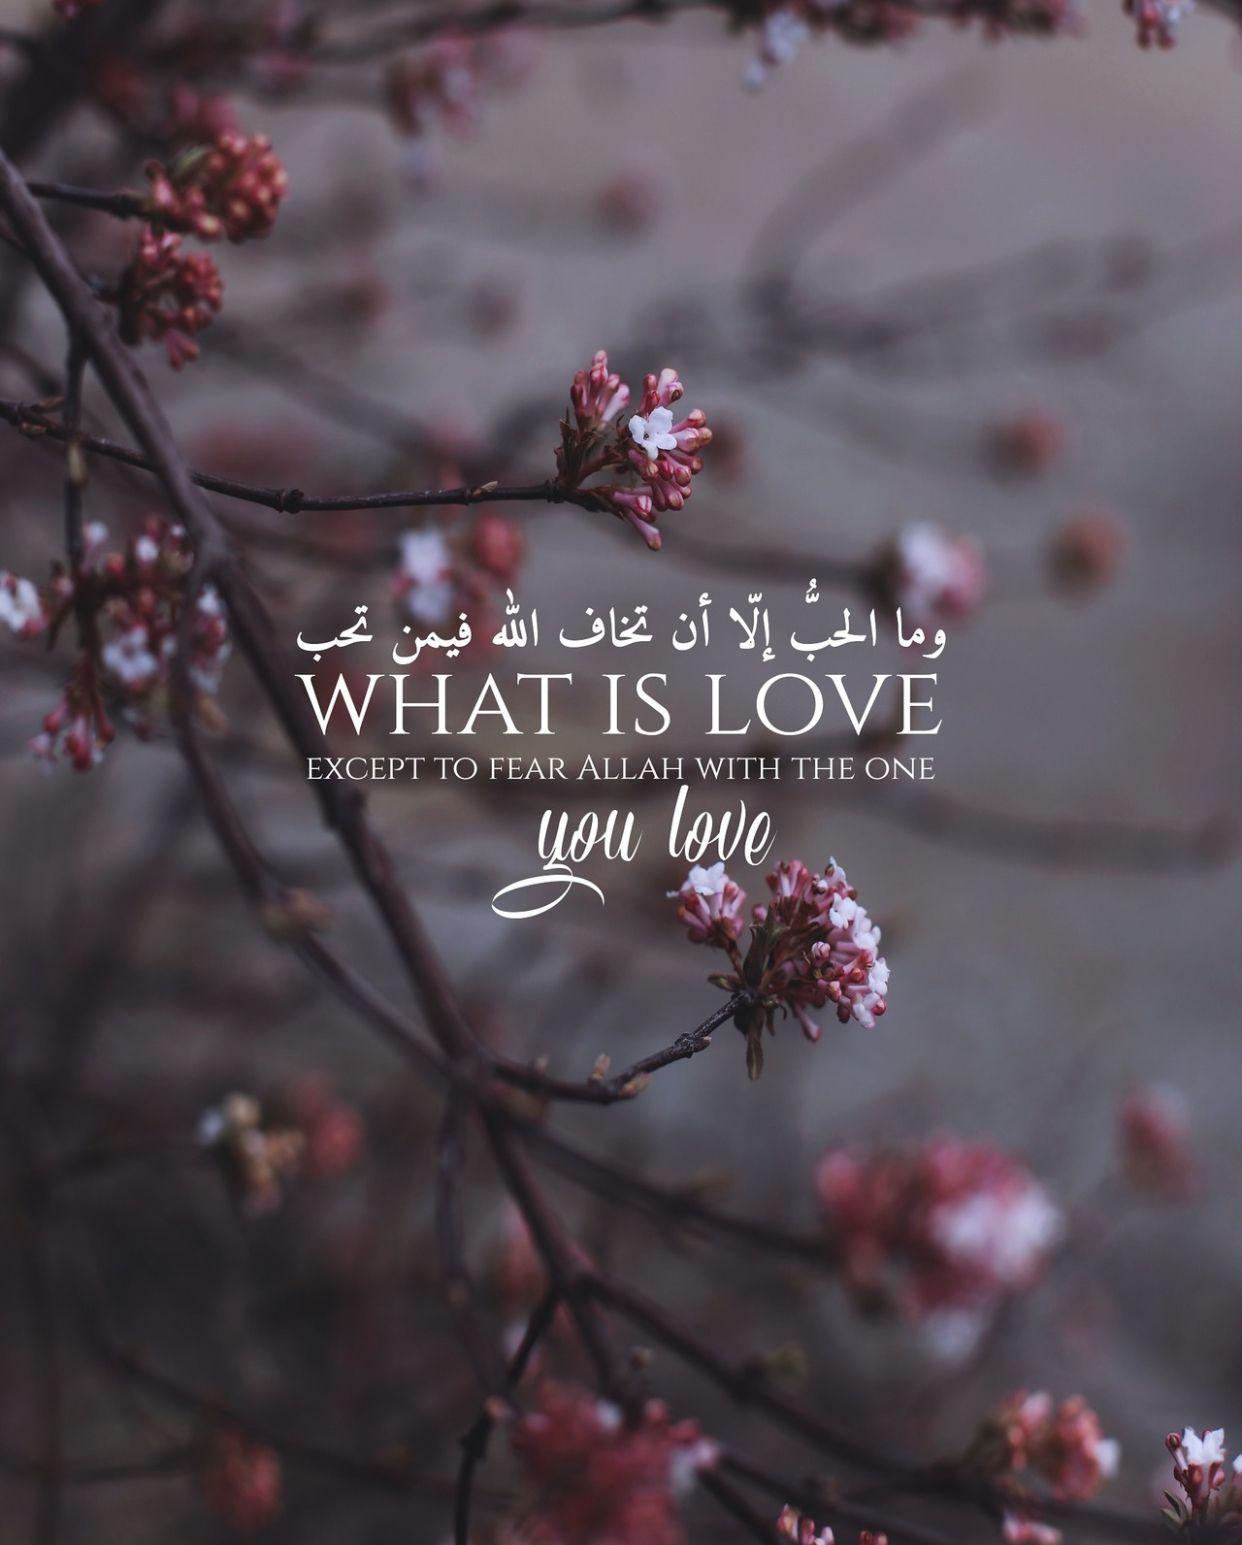 Pin By Yara Bassri On Quran Verses Islamic Quotes Quran Quotes Love Quran Quotes Love Scriptures